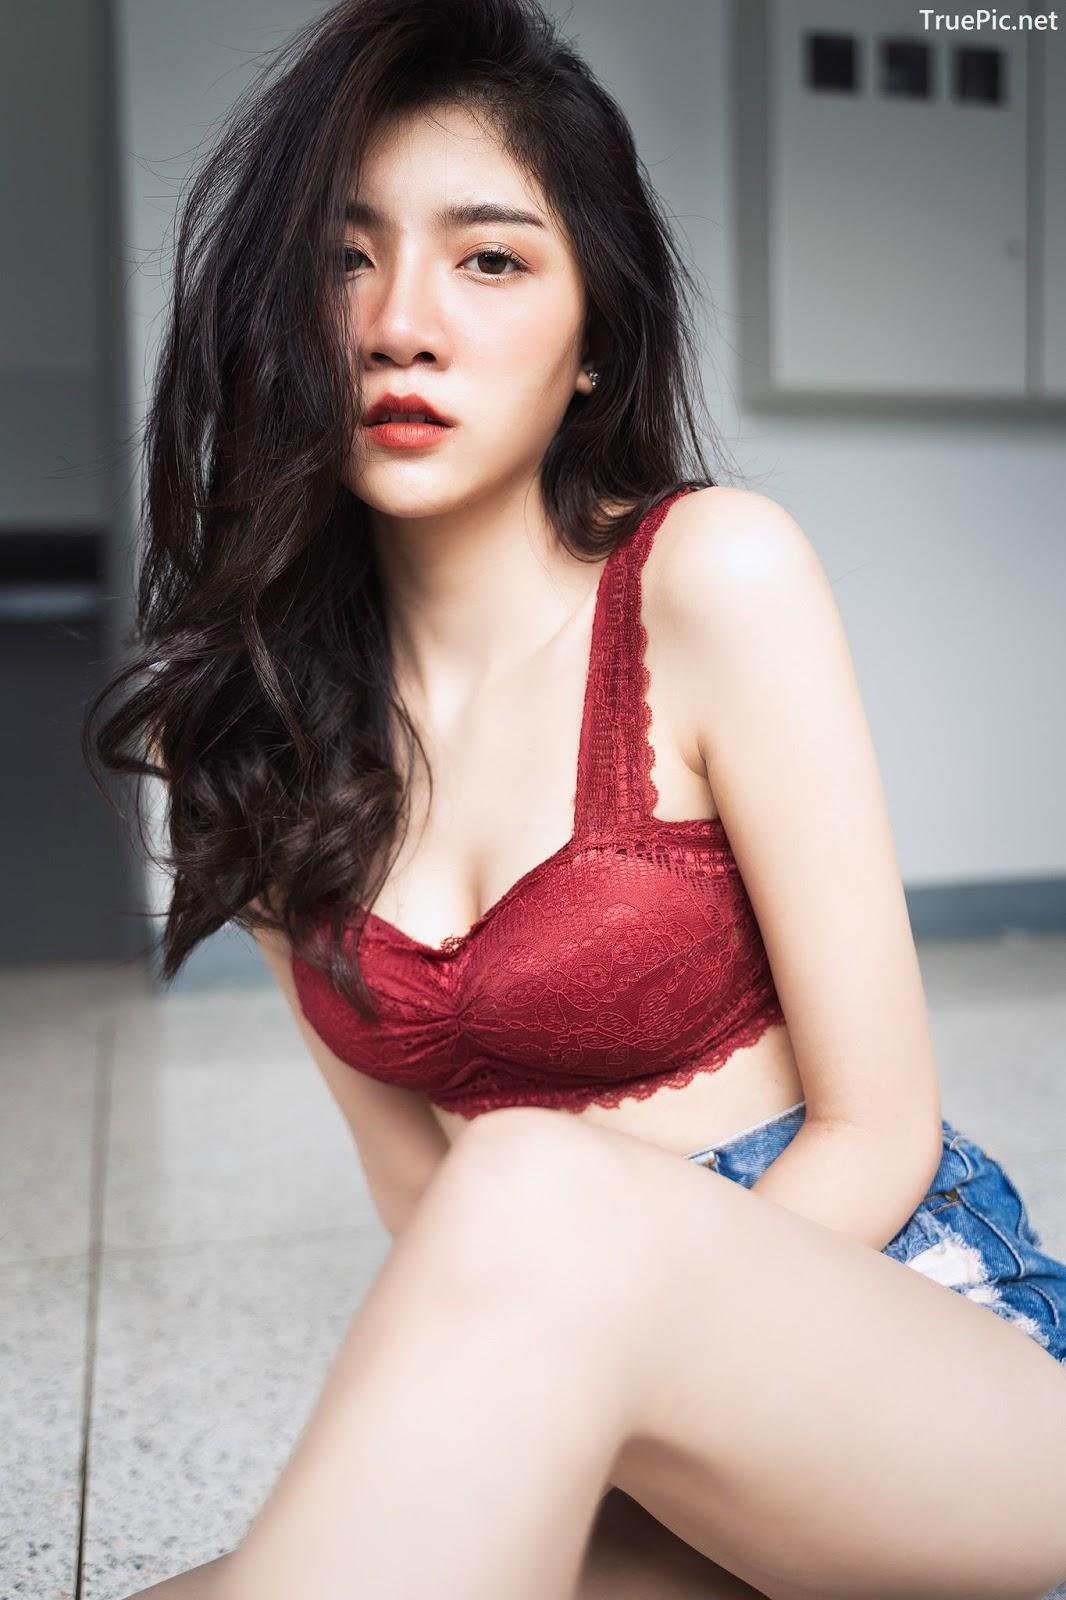 Image Thailand Model - Sasi Ngiunwan - Strawberry Cake - TruePic.net - Picture-3